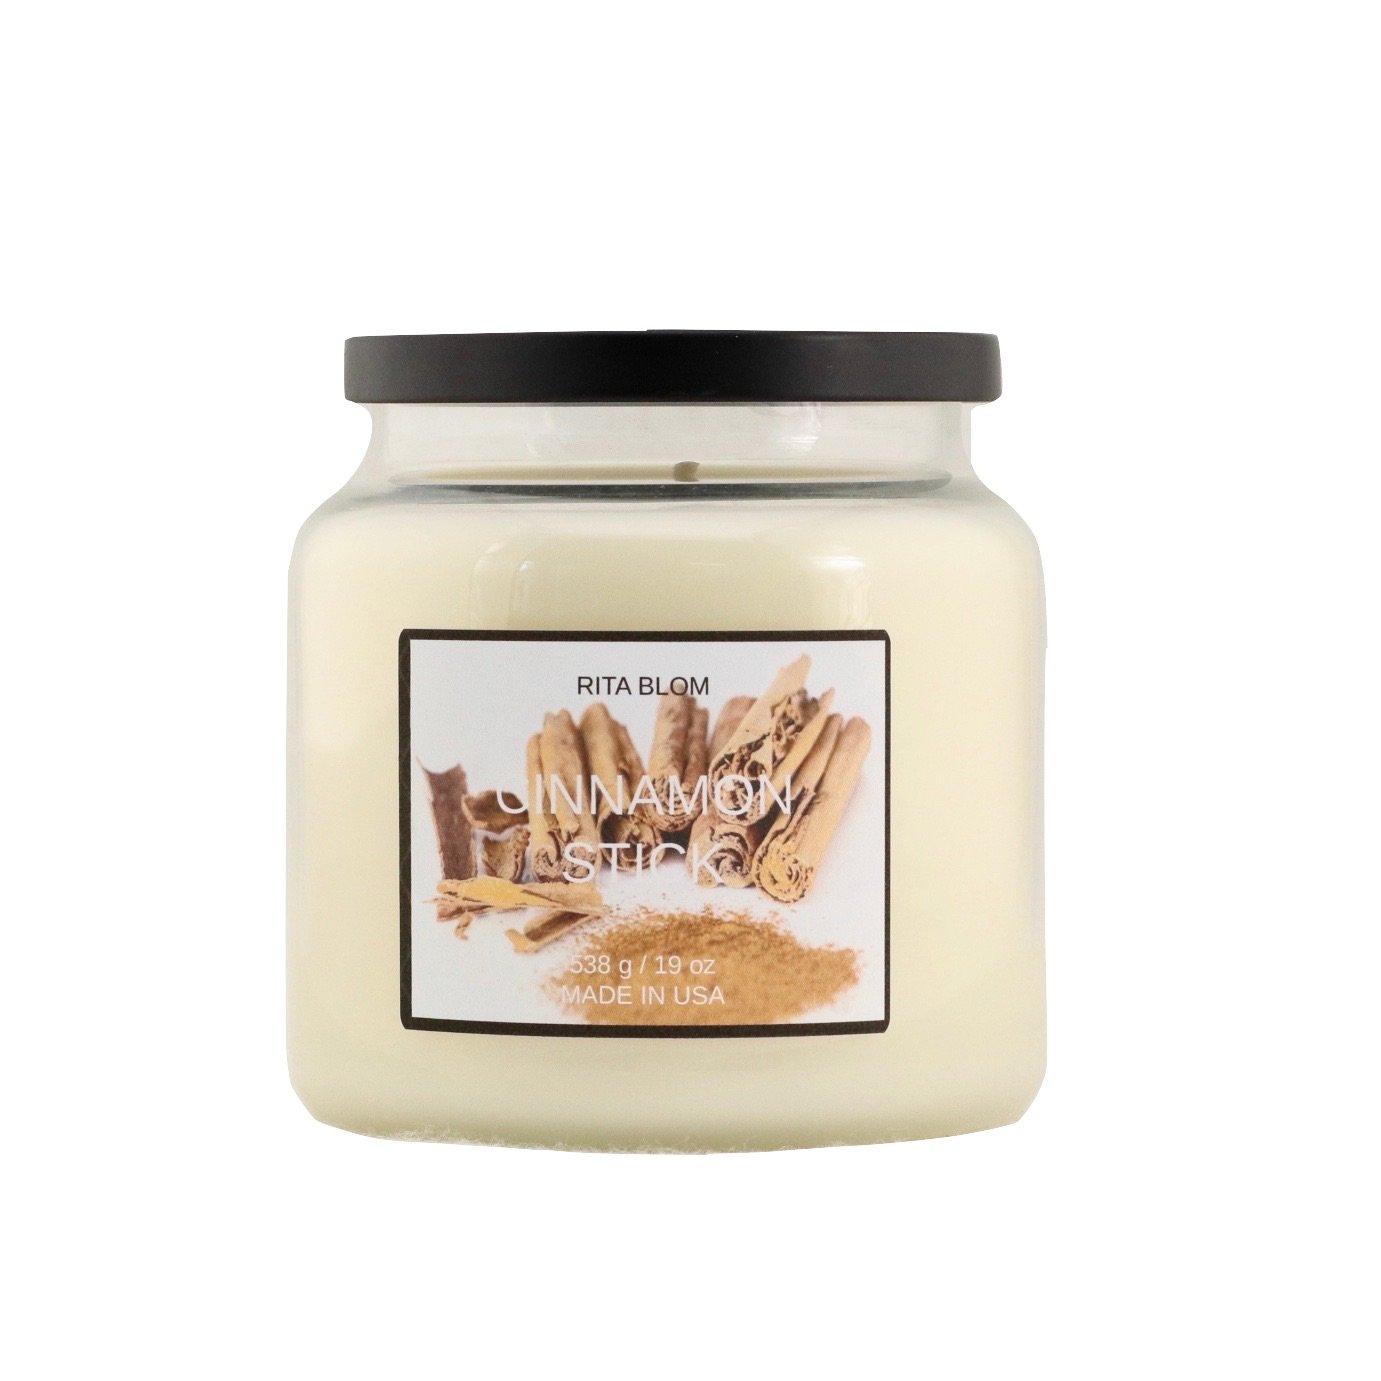 Rita Blom Natural Soy Wax 19 oz Large Jar Candle Cinnamon Stick